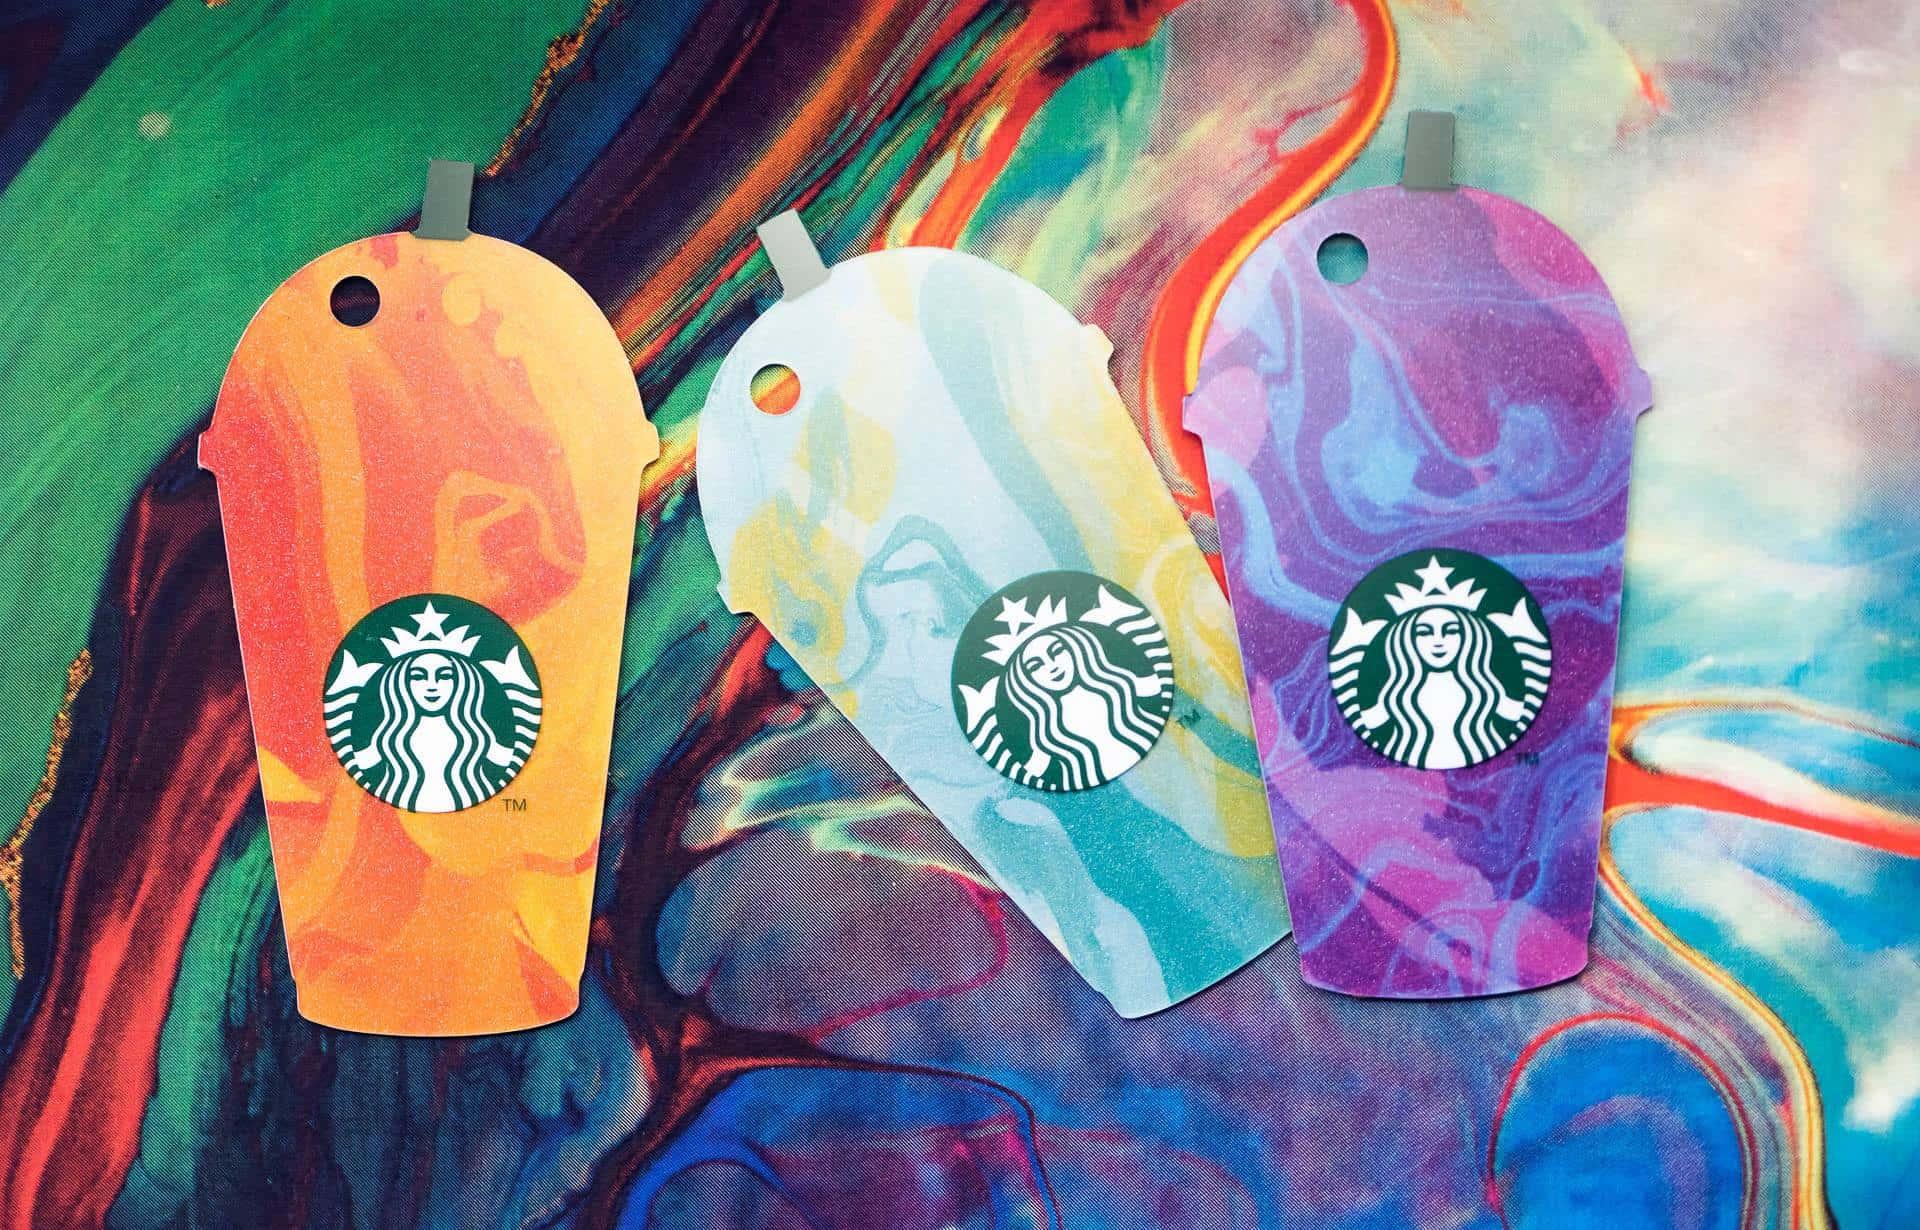 Credit: Starbucks Singapore